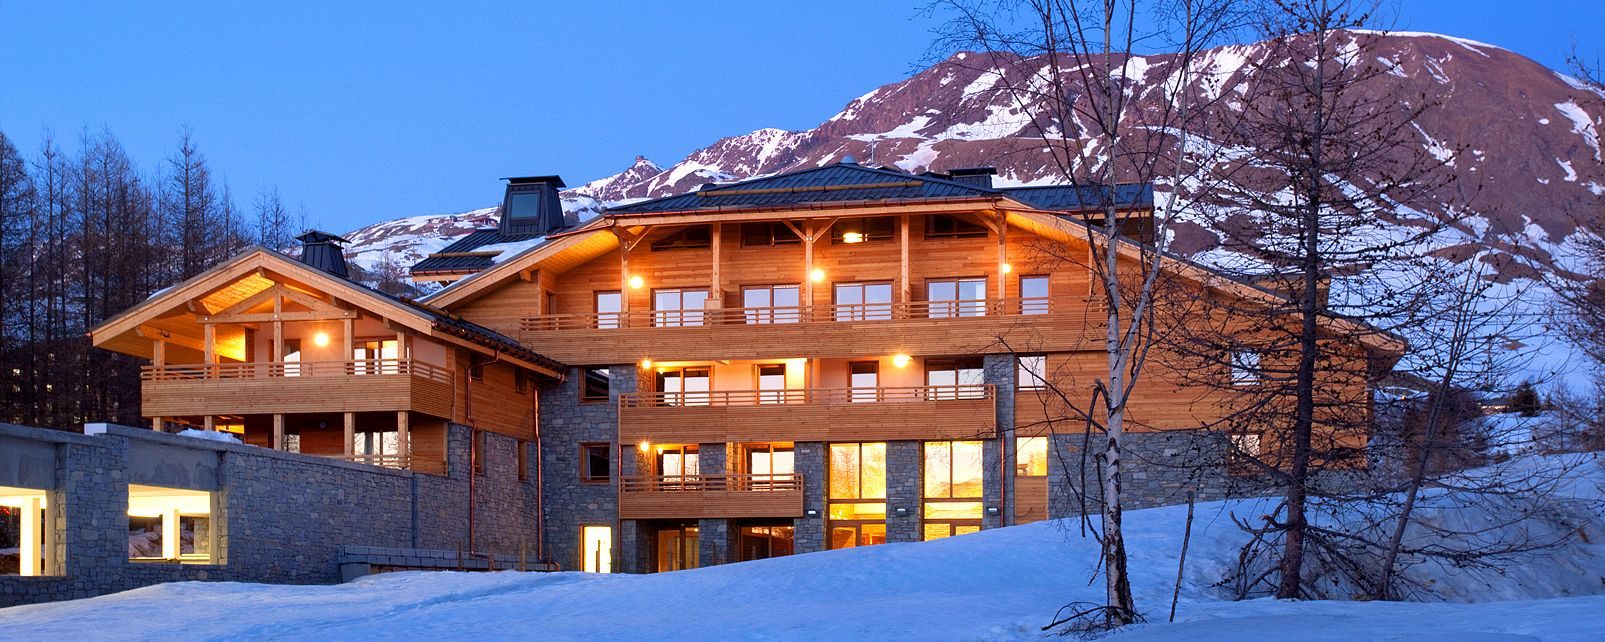 Hôtel Alpenrose